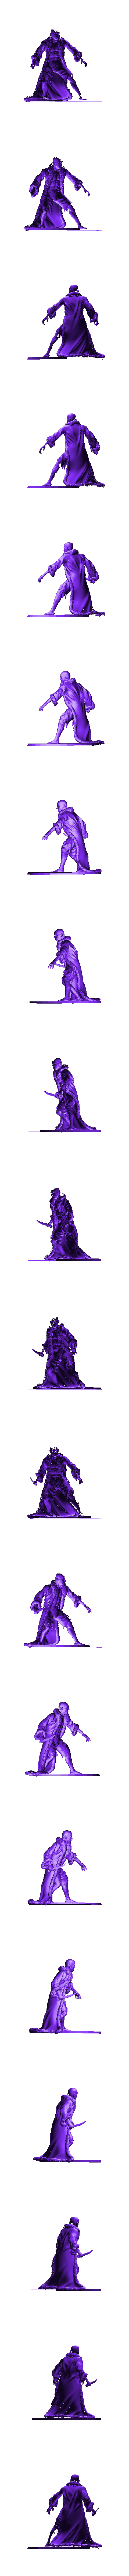 Thif.stl Download free STL file Thief with furcoat • 3D print model, Boris3dStudio